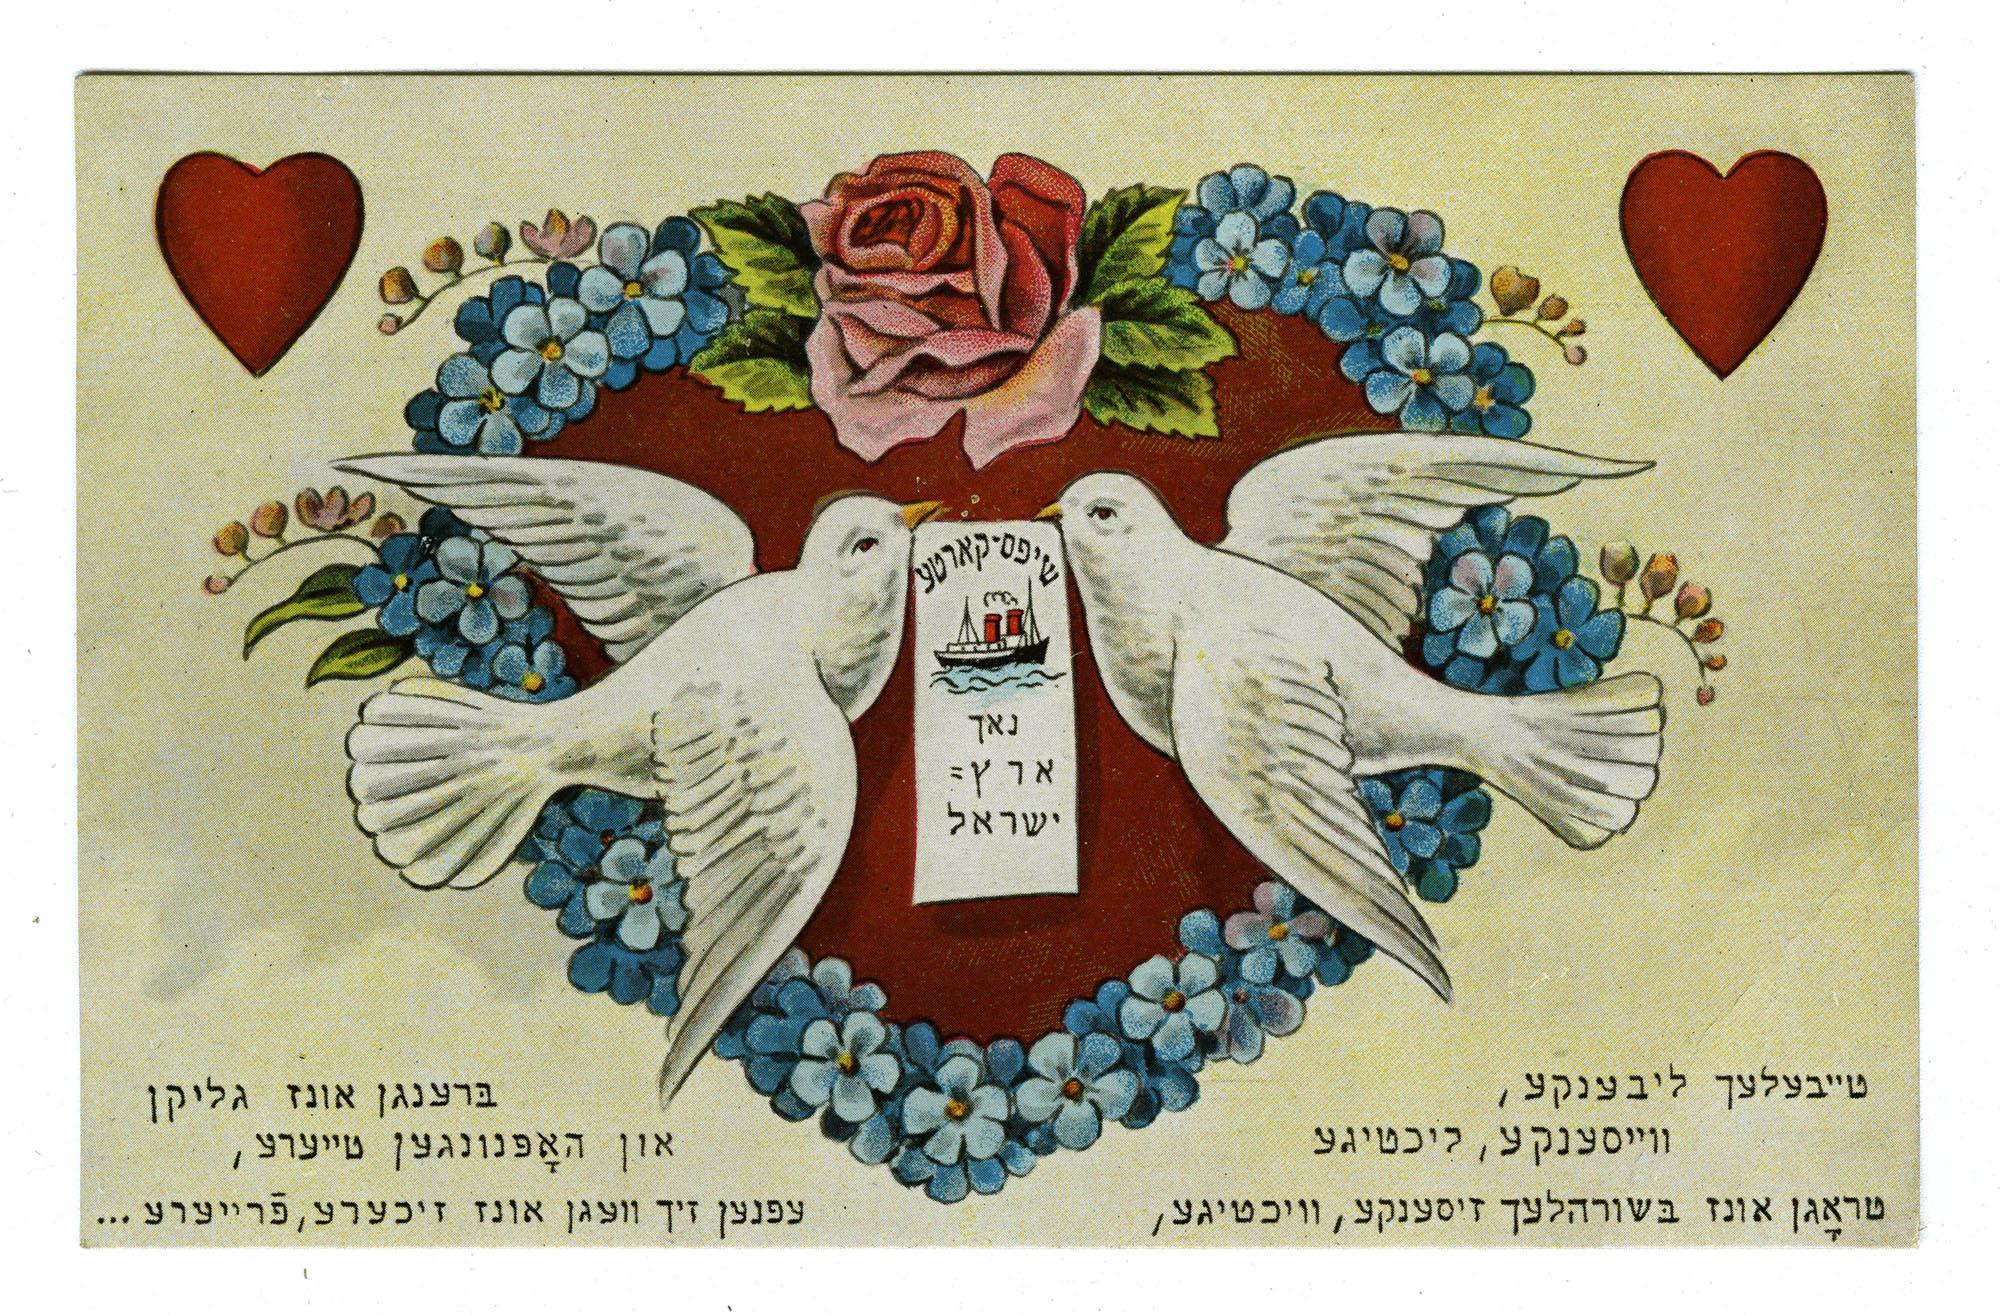 שיפס-קארטע נאך ארץ-ישראל